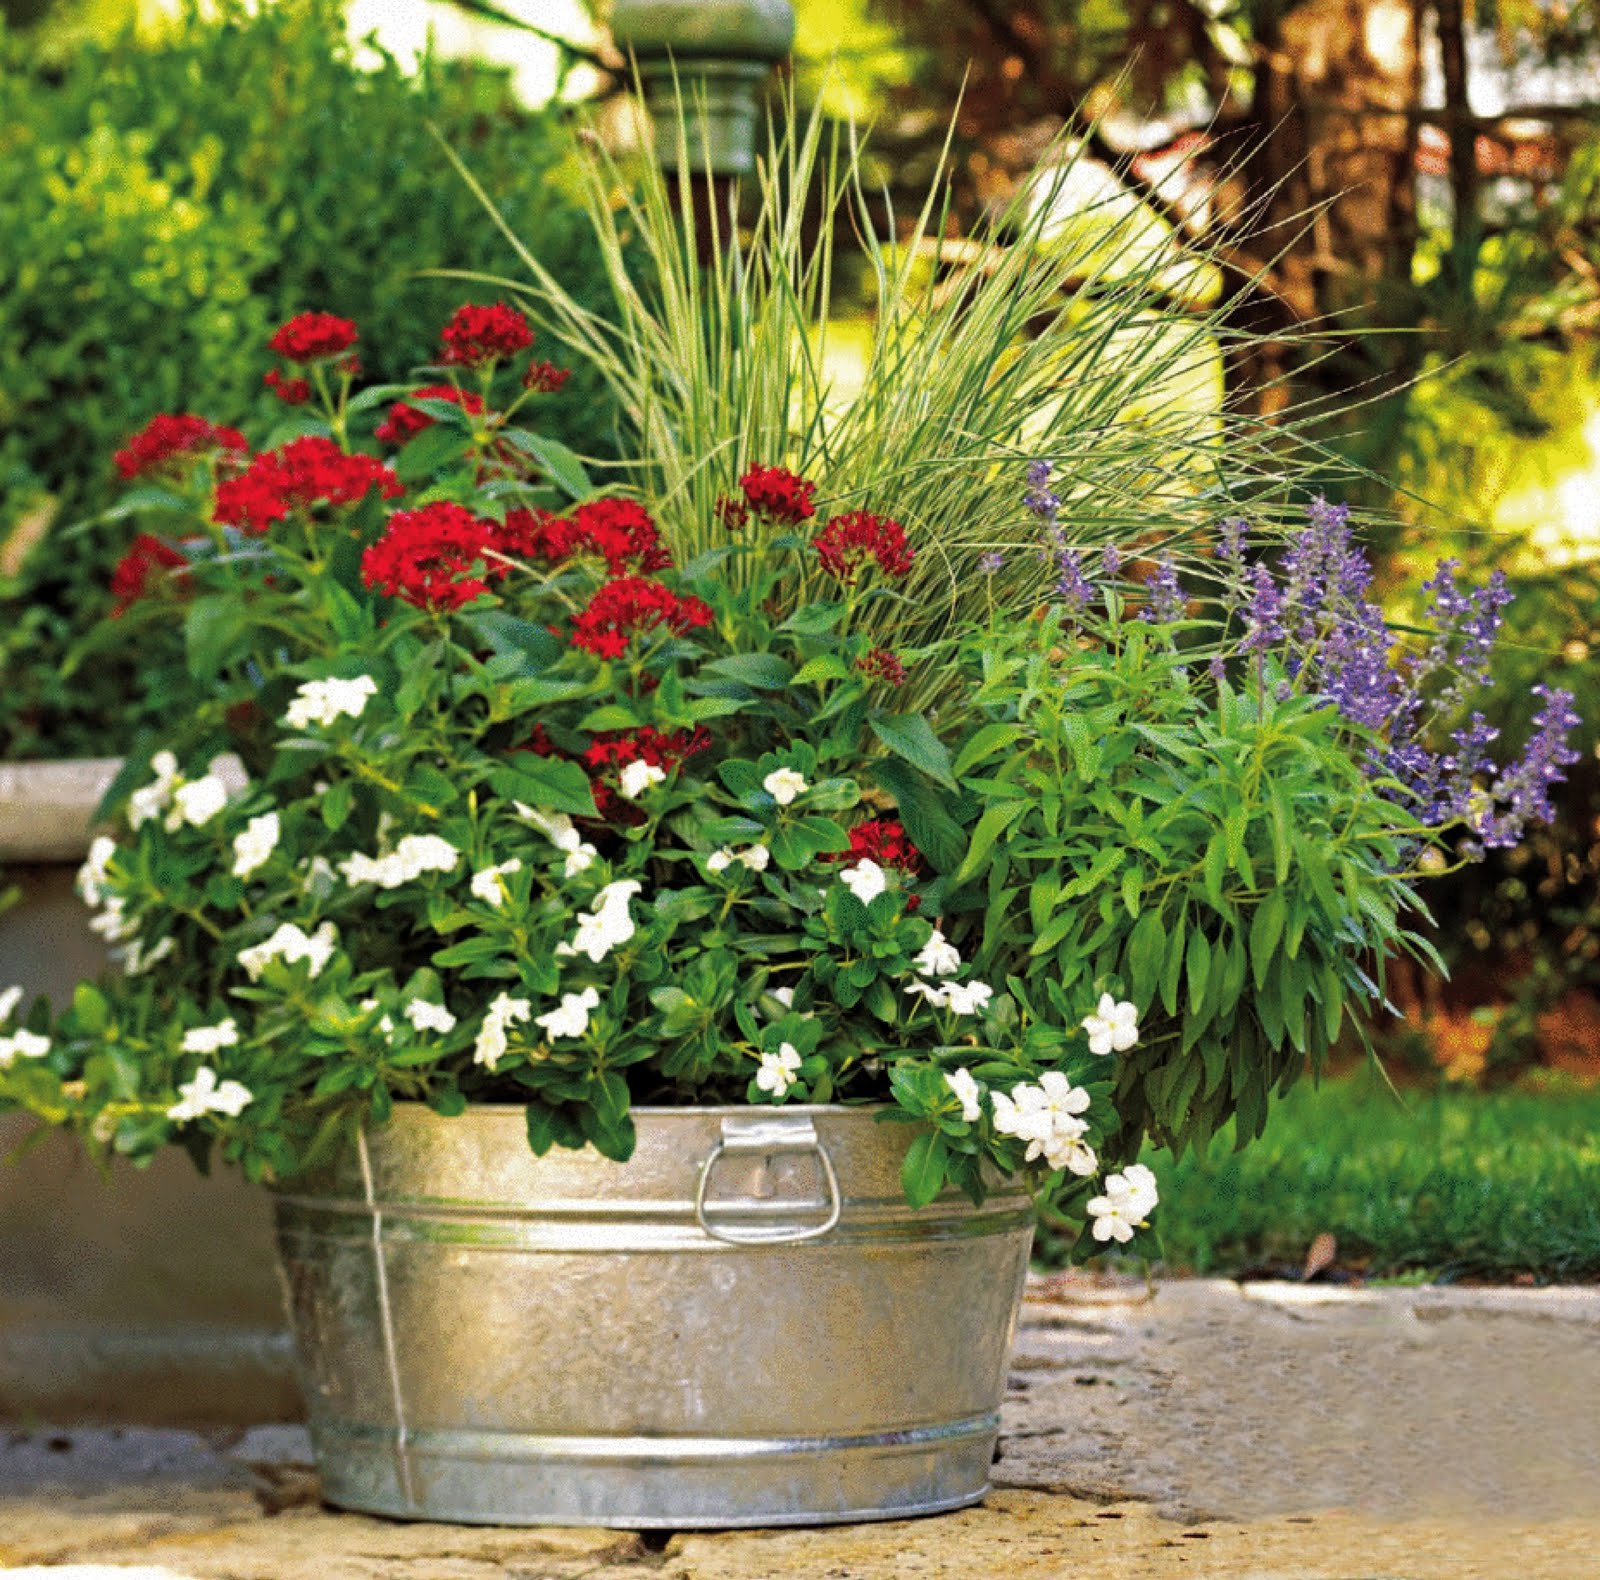 plantas jardins vasos:Casa da Nane: Jardim 02 – Vasos de Alumínios